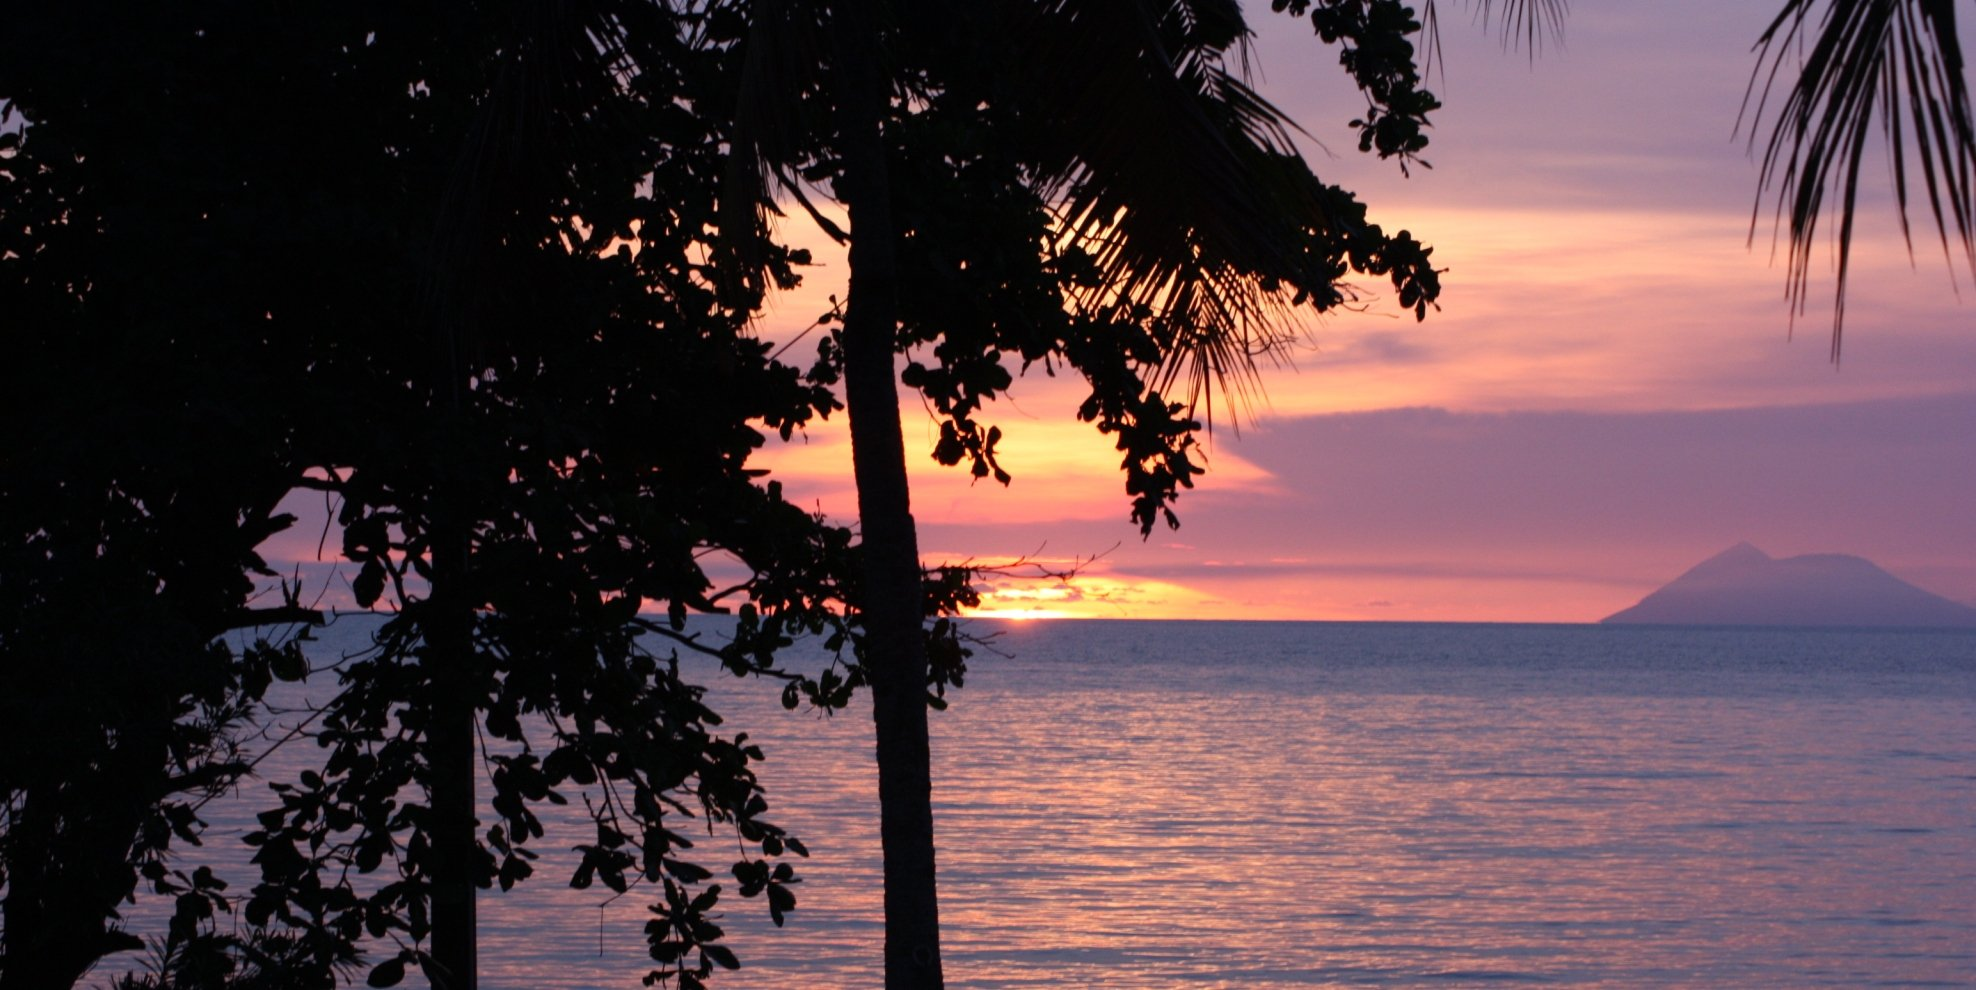 Anyer sunset